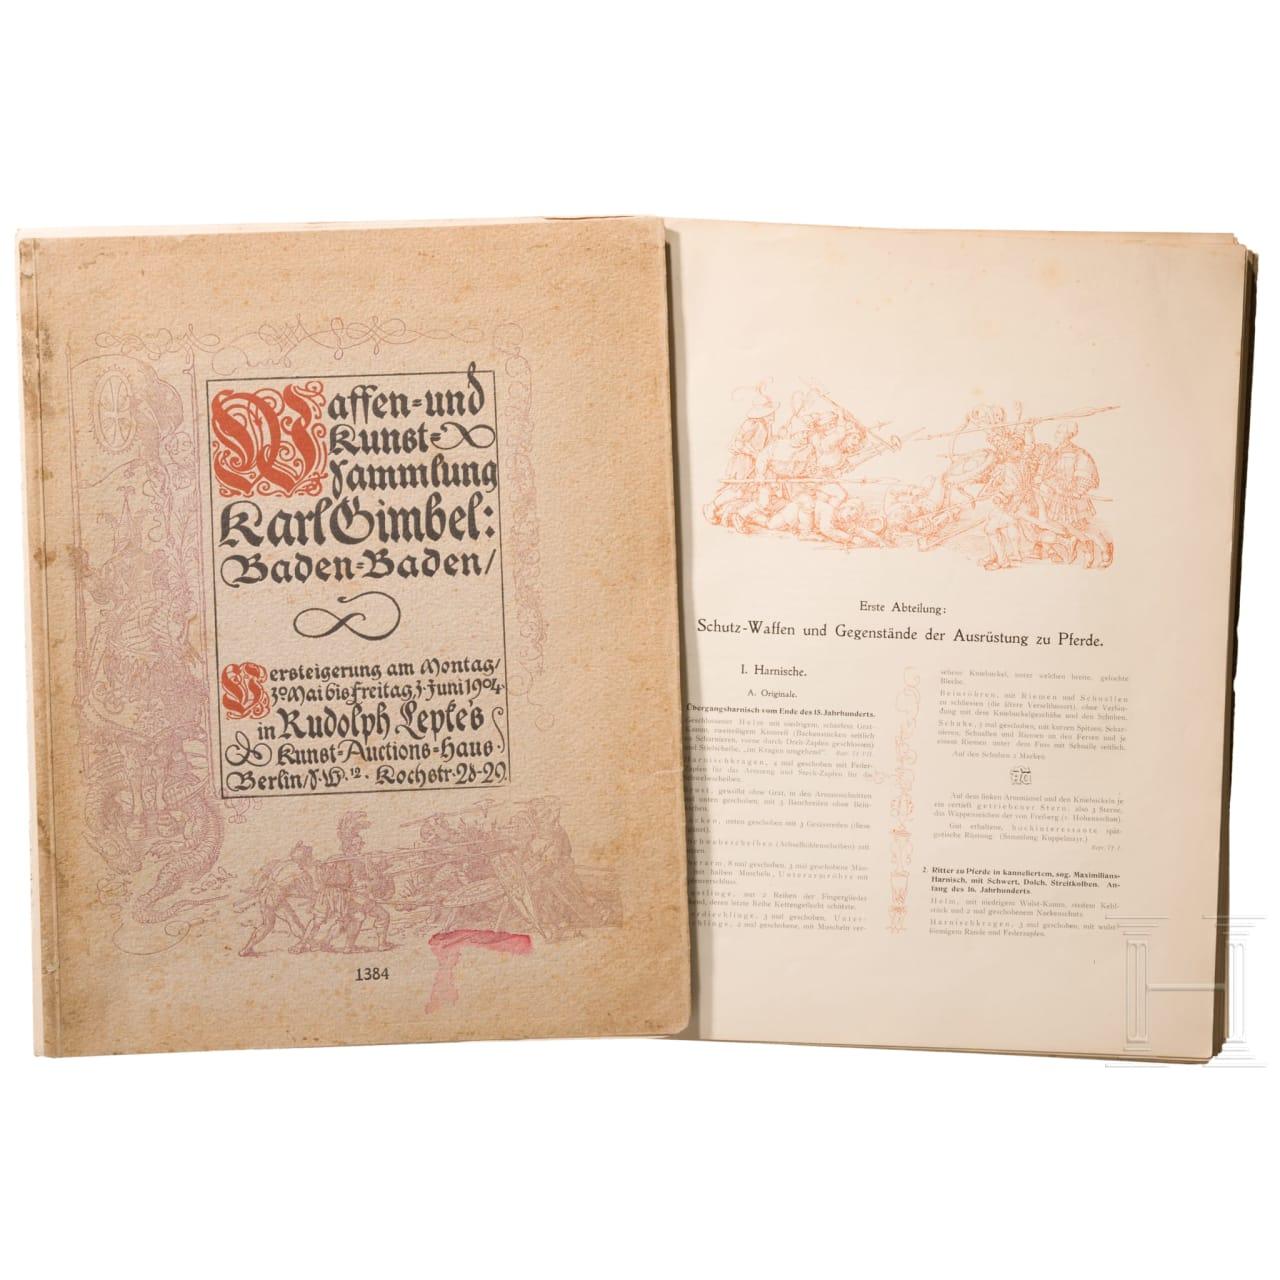 Auktionskatalog der Waffensammlung Karl Gimbel, Berlin, 1904